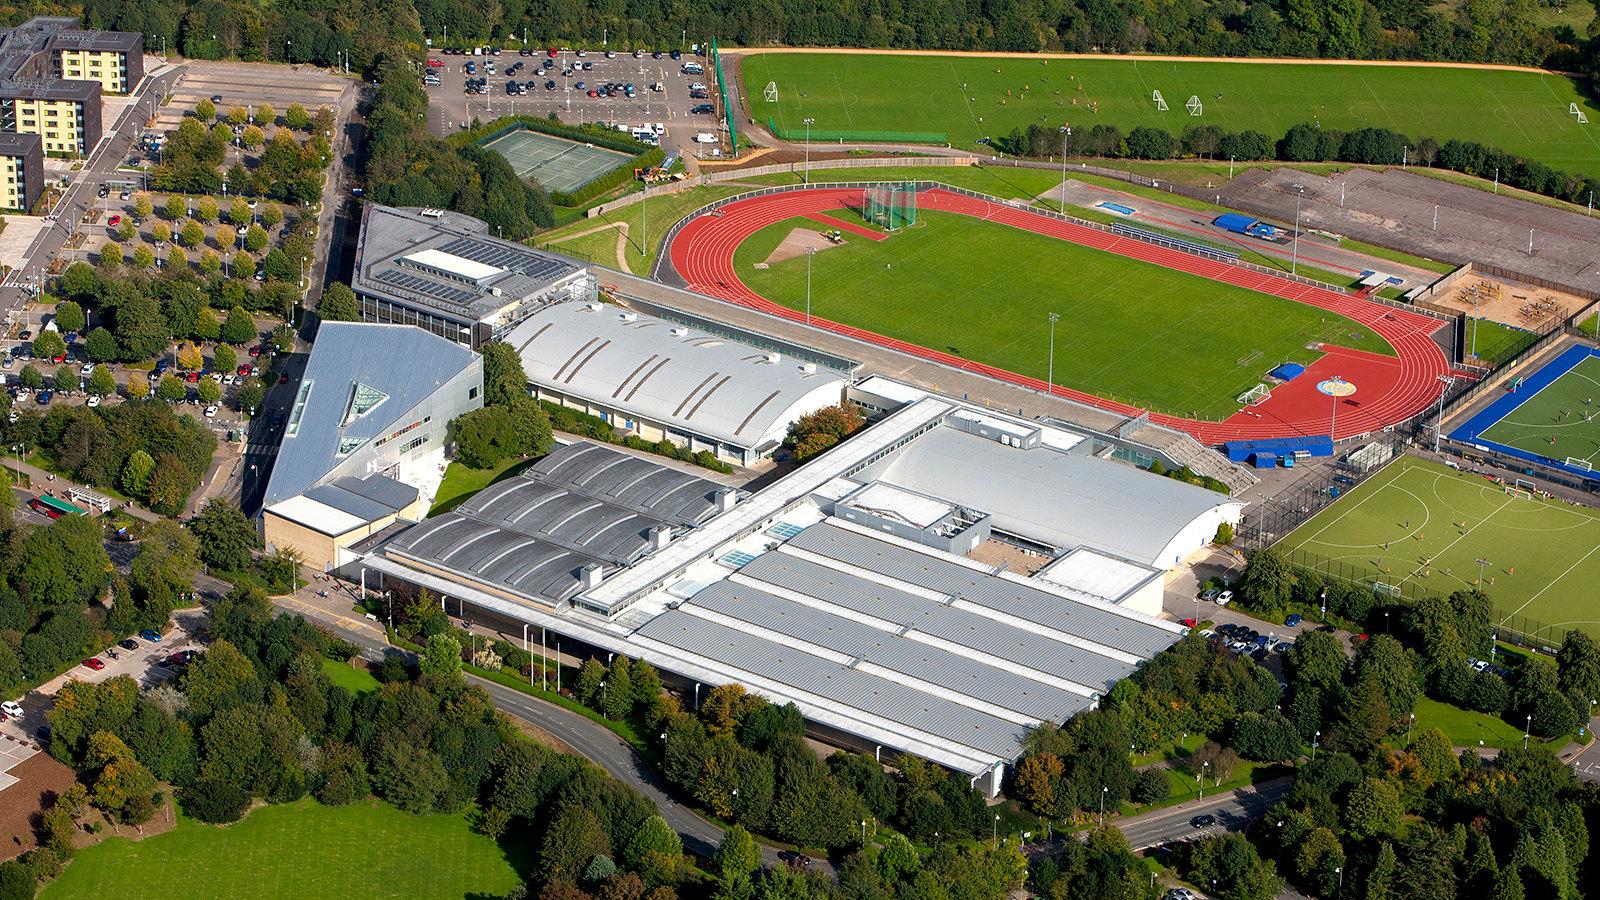 An aerial view of the Team Bath Sports Training Village